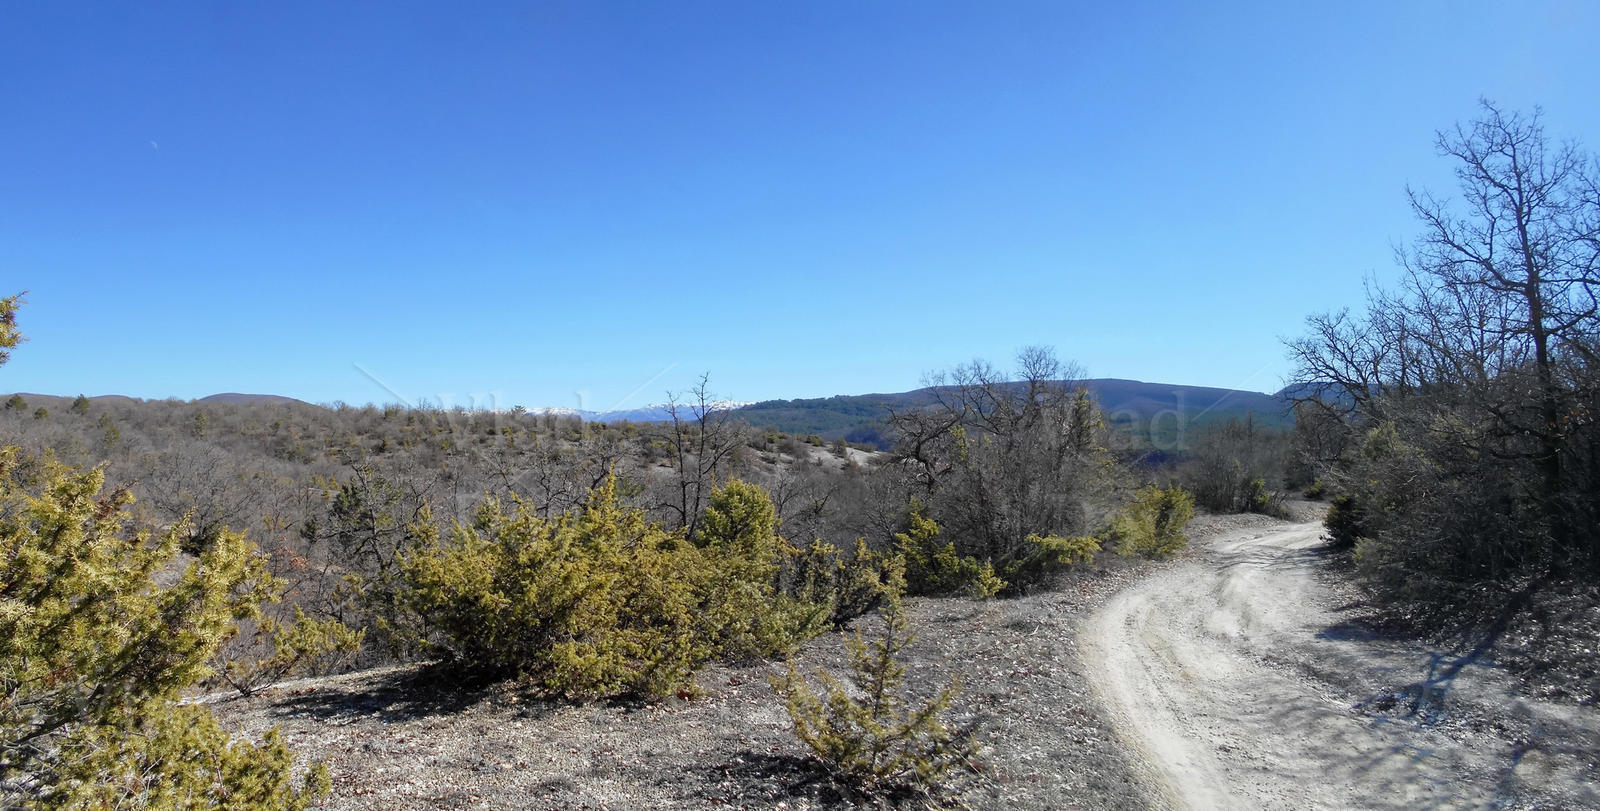 Mount Tepe Kermen area, Crimea, March 5 2017 by anyword